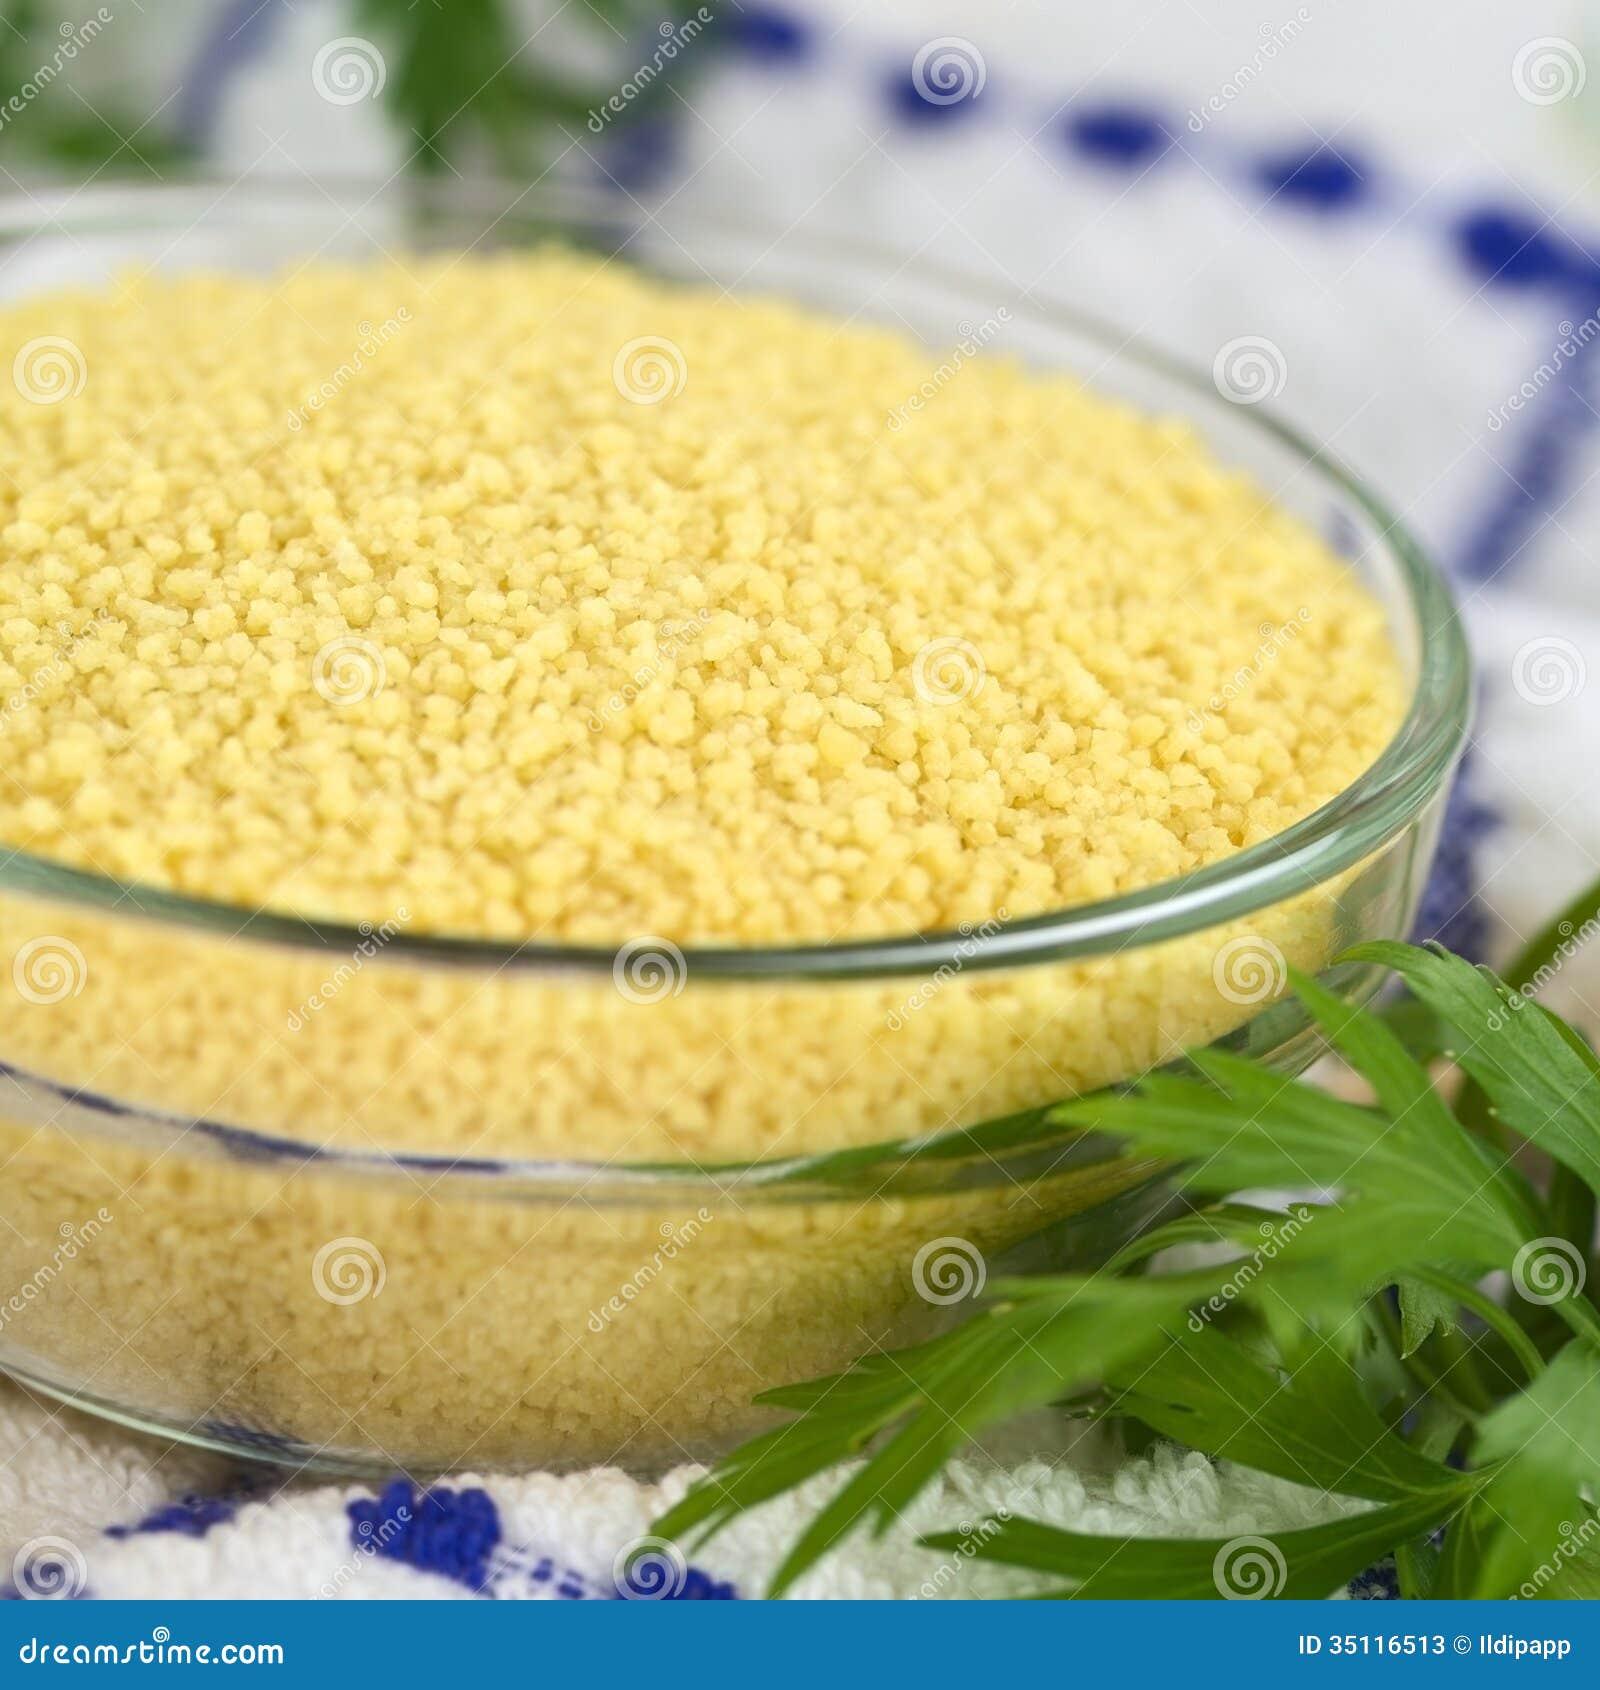 Raw Couscous Stock Photos - Image: 35116513